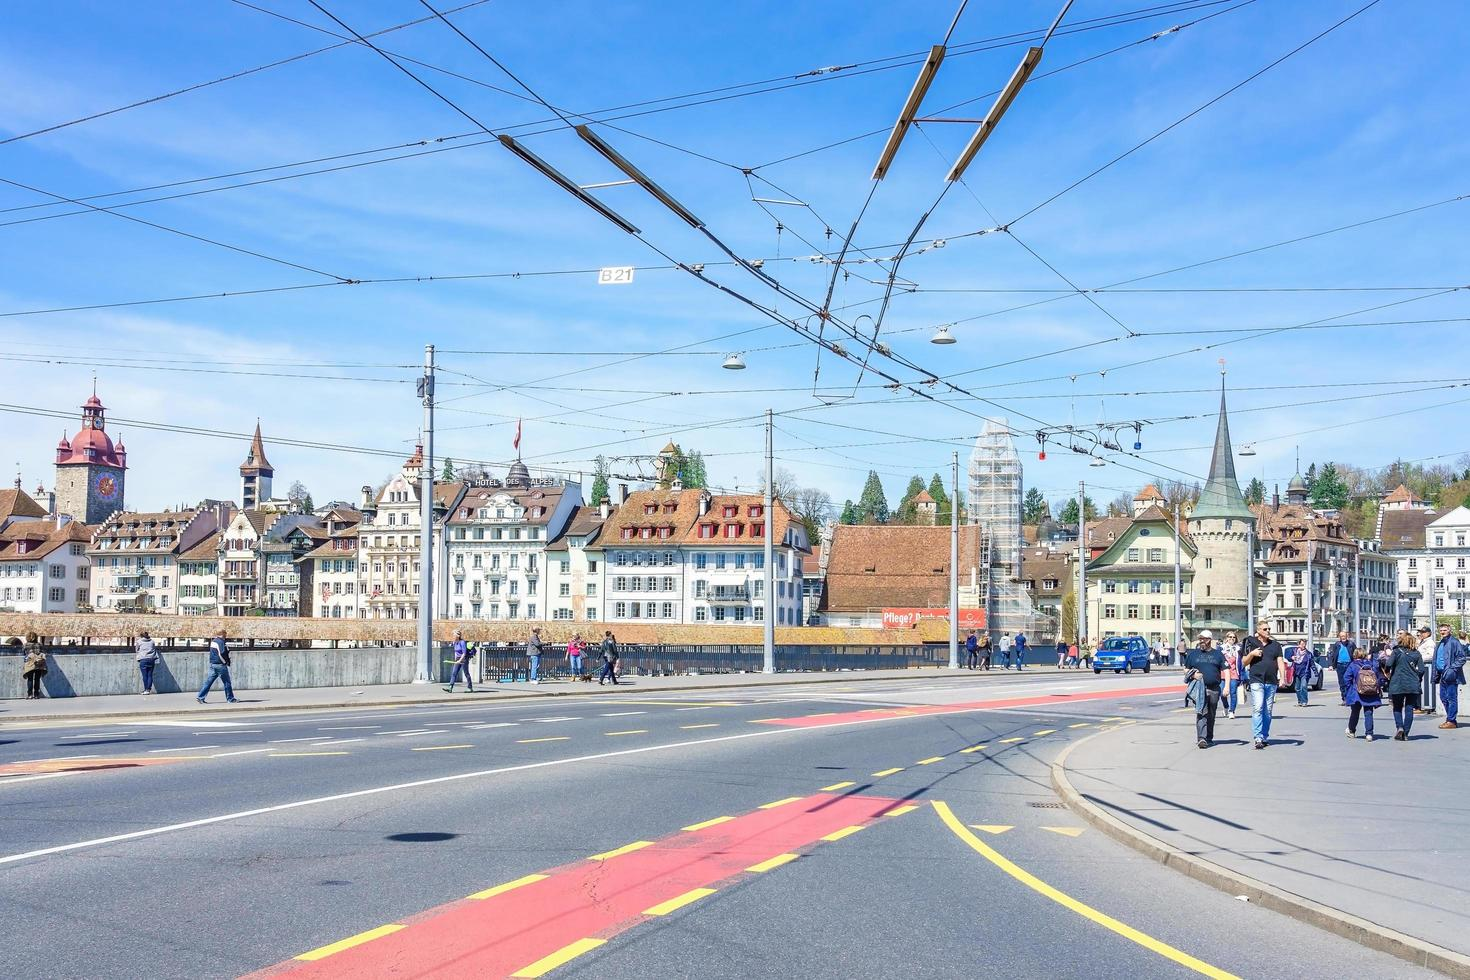 centro histórico de luzern, suiza, 2018 foto